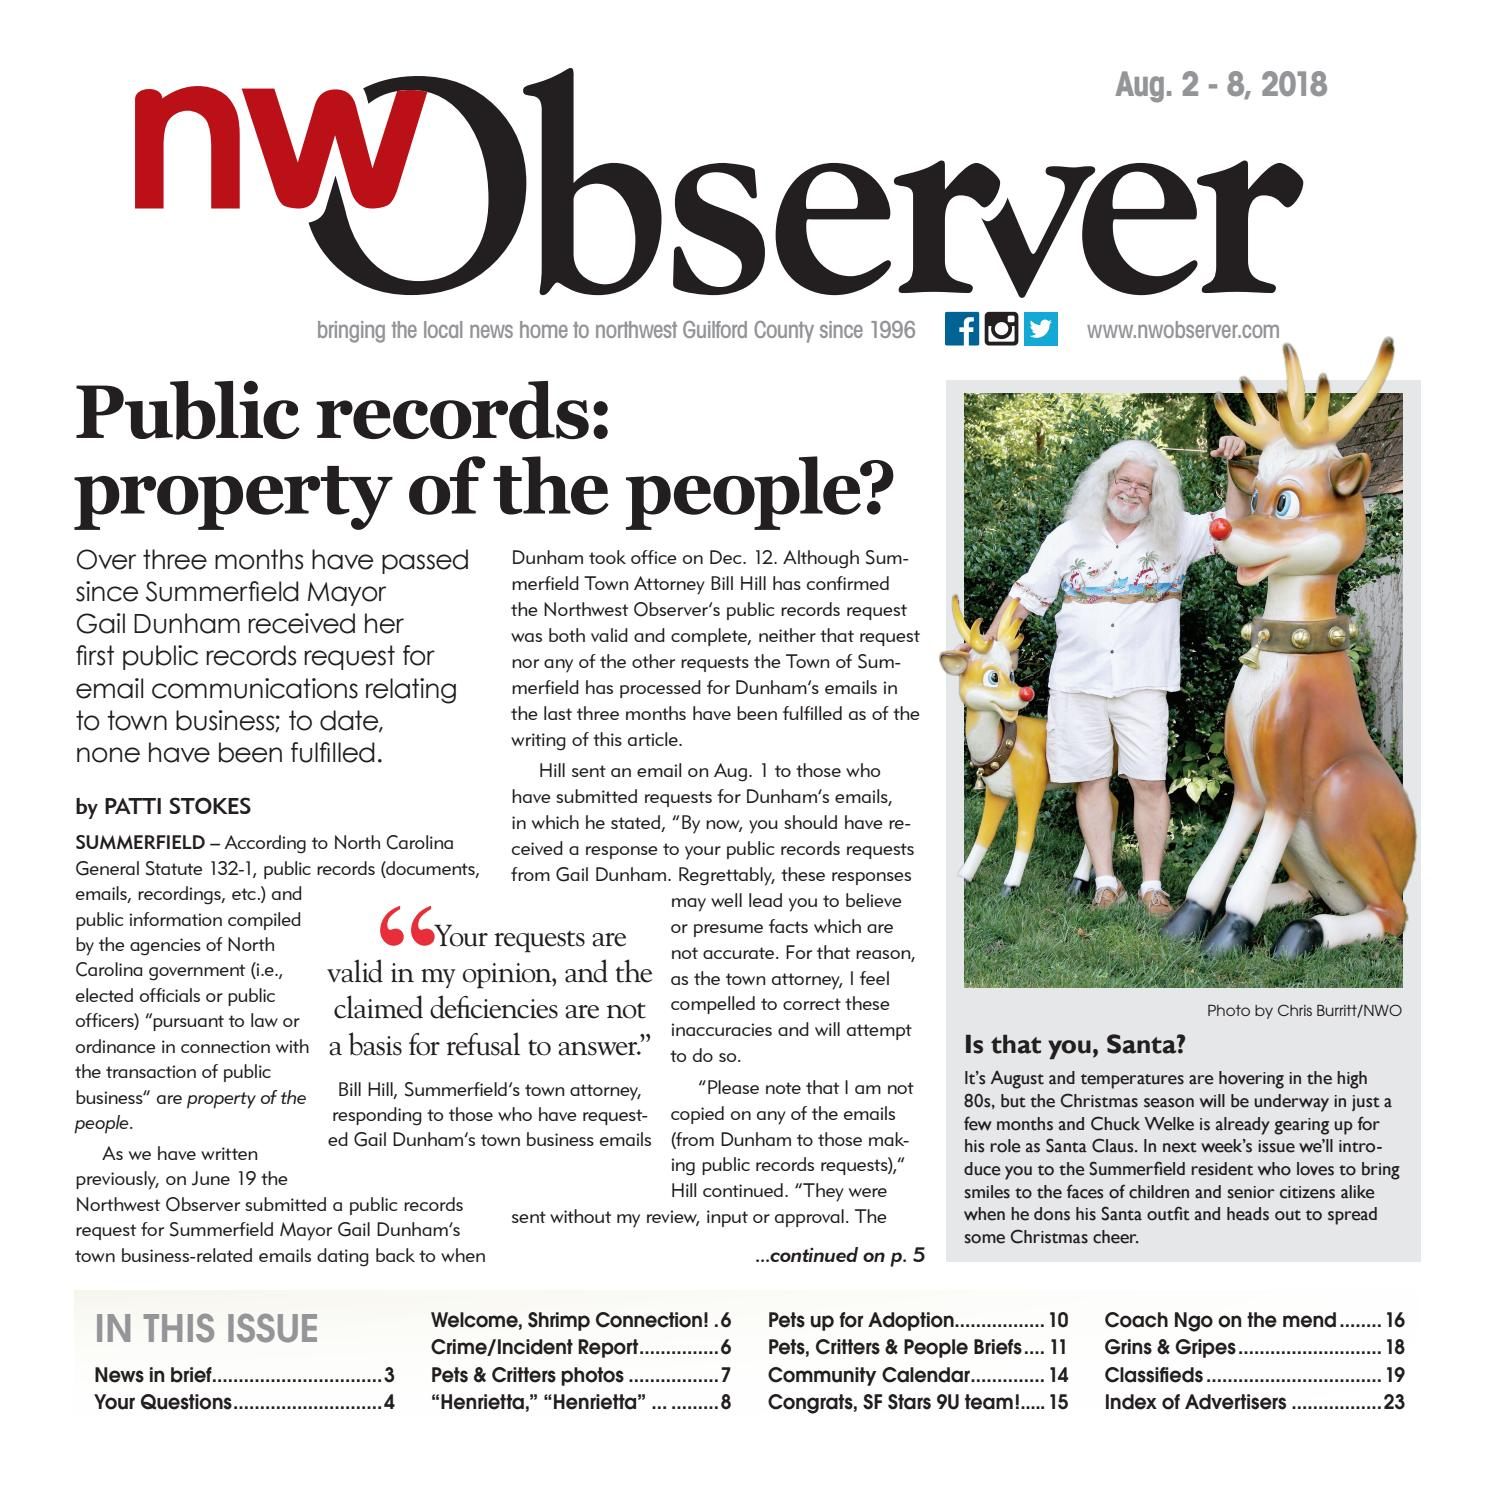 Northwest Observer